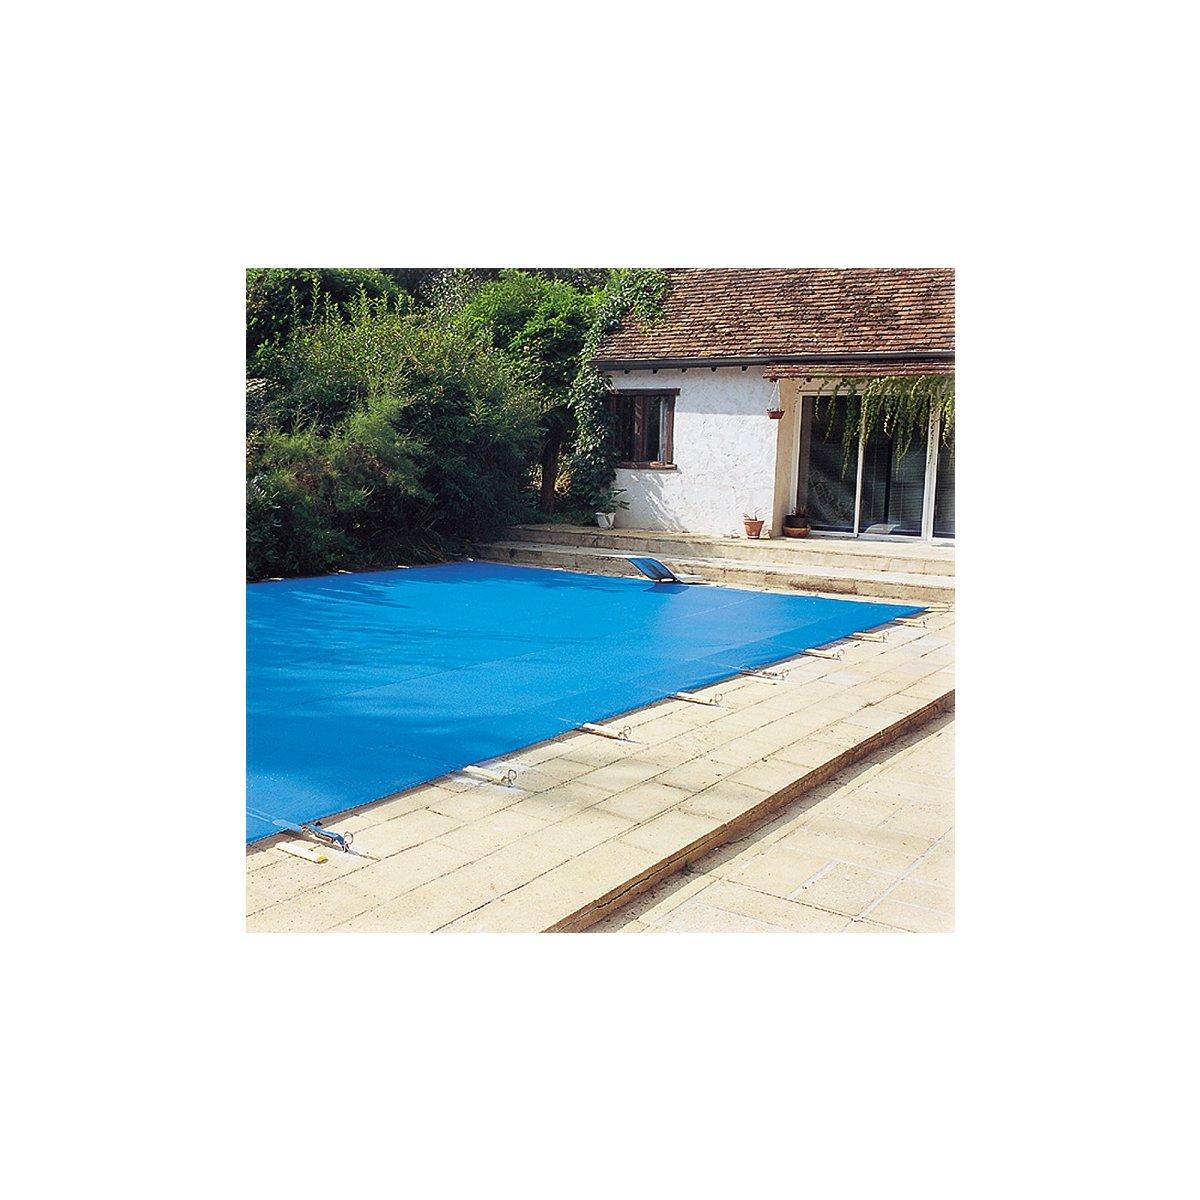 Wellpool24 winternetz poolabdeckung ma anfertigung 20 for Hersteller poolfolien